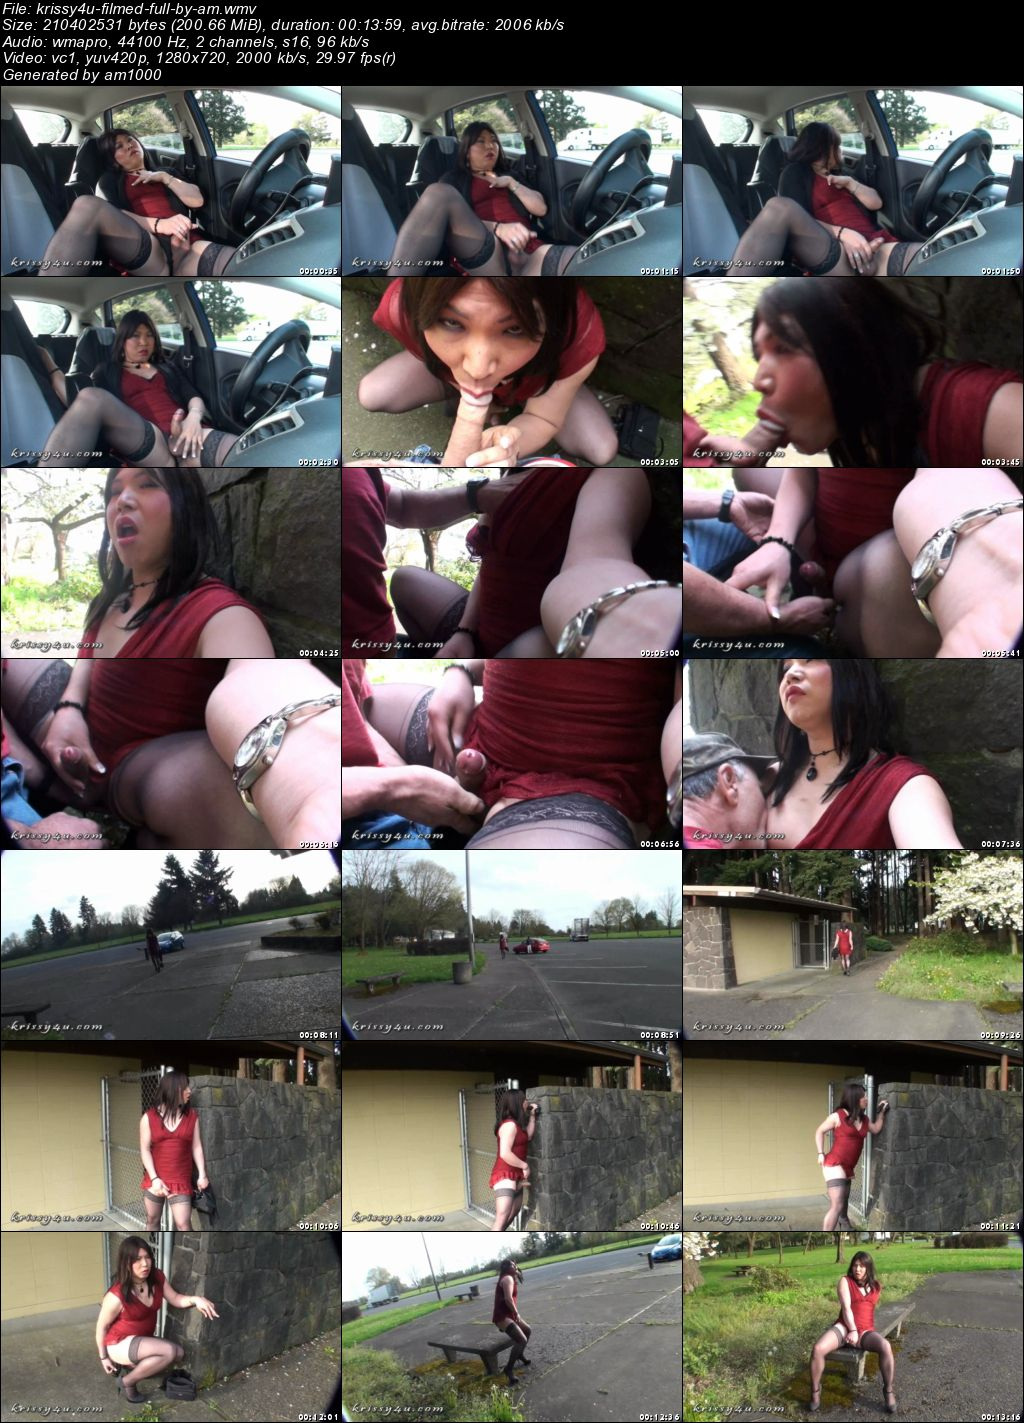 krissy4u-filmed-full-by-am.jpeg